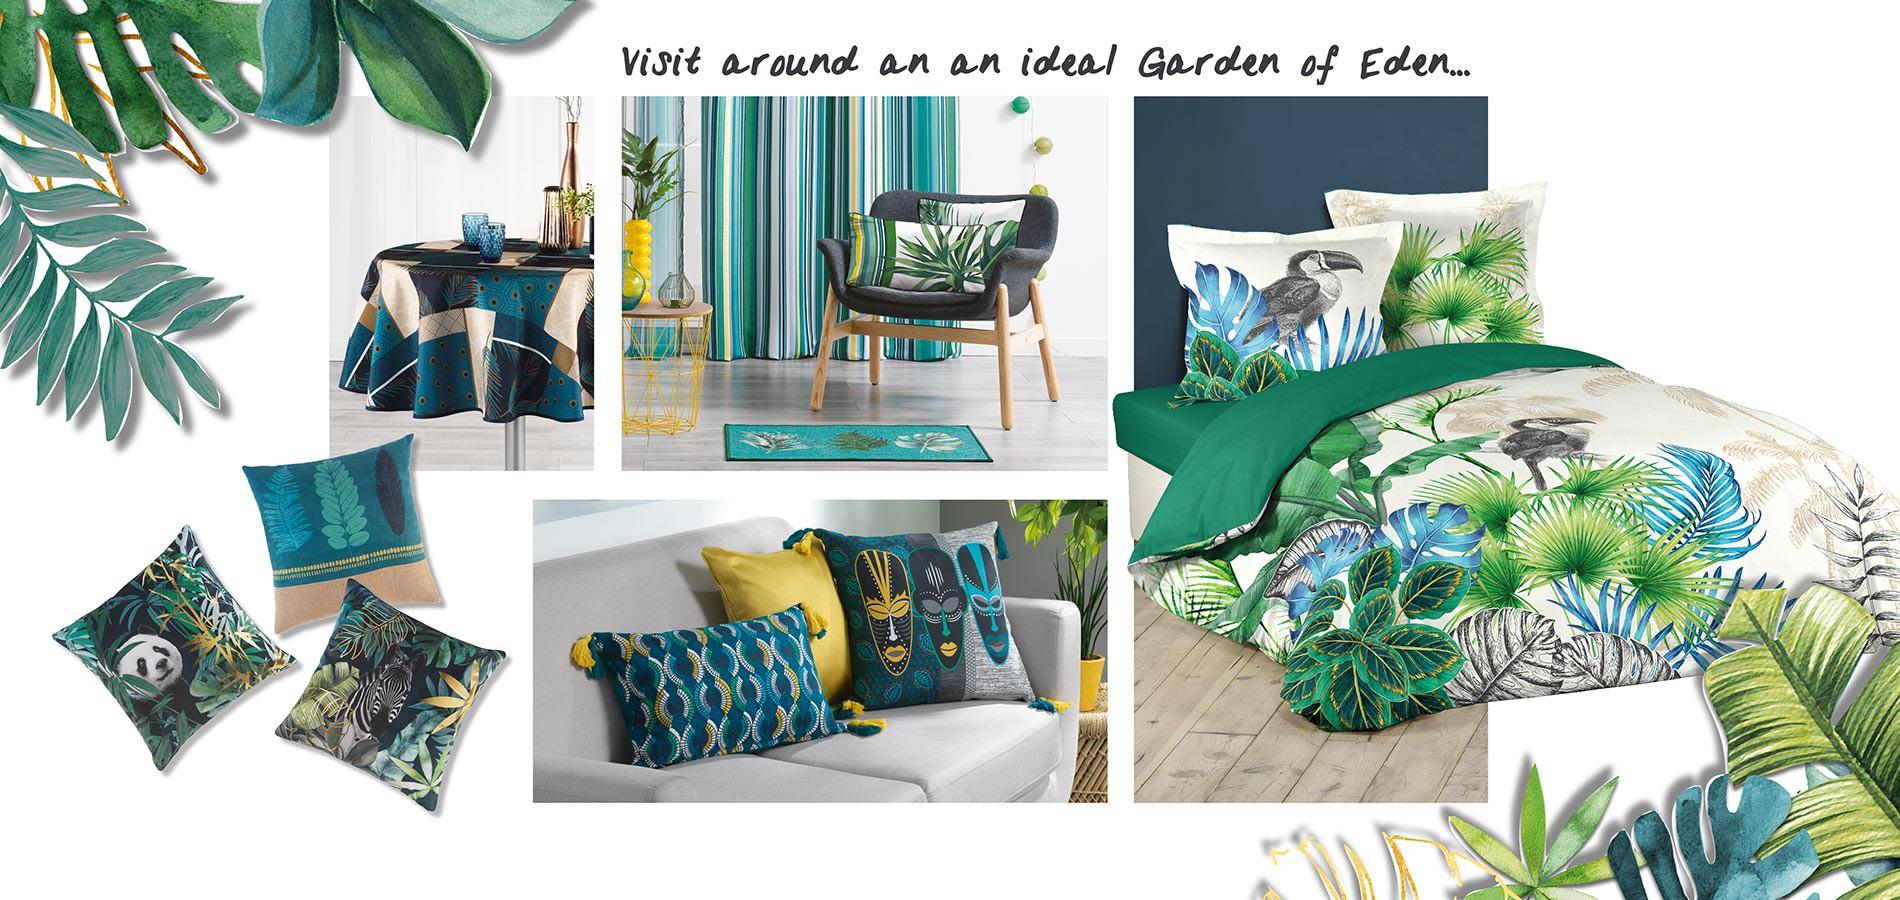 U10 - Douceur d'intérieur - 2019 Trend - Vegetal - garden of eden